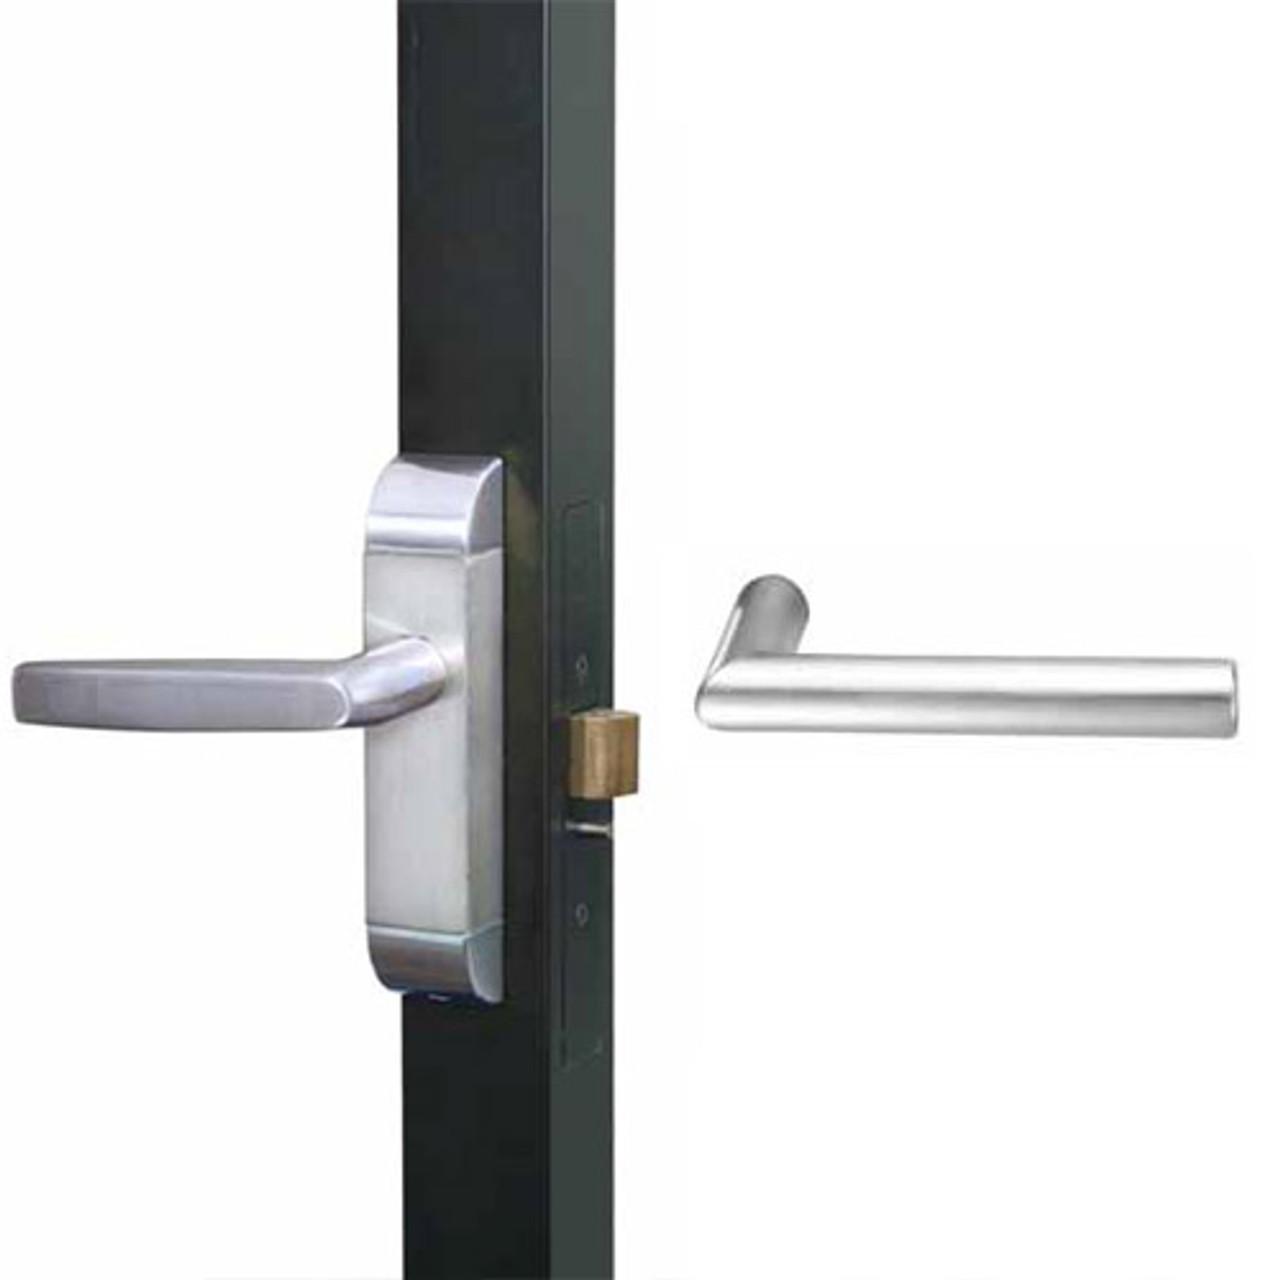 4600-MI-632-US32 Adams Rite MI Designer Deadlatch handle in Bright Stainless Finish